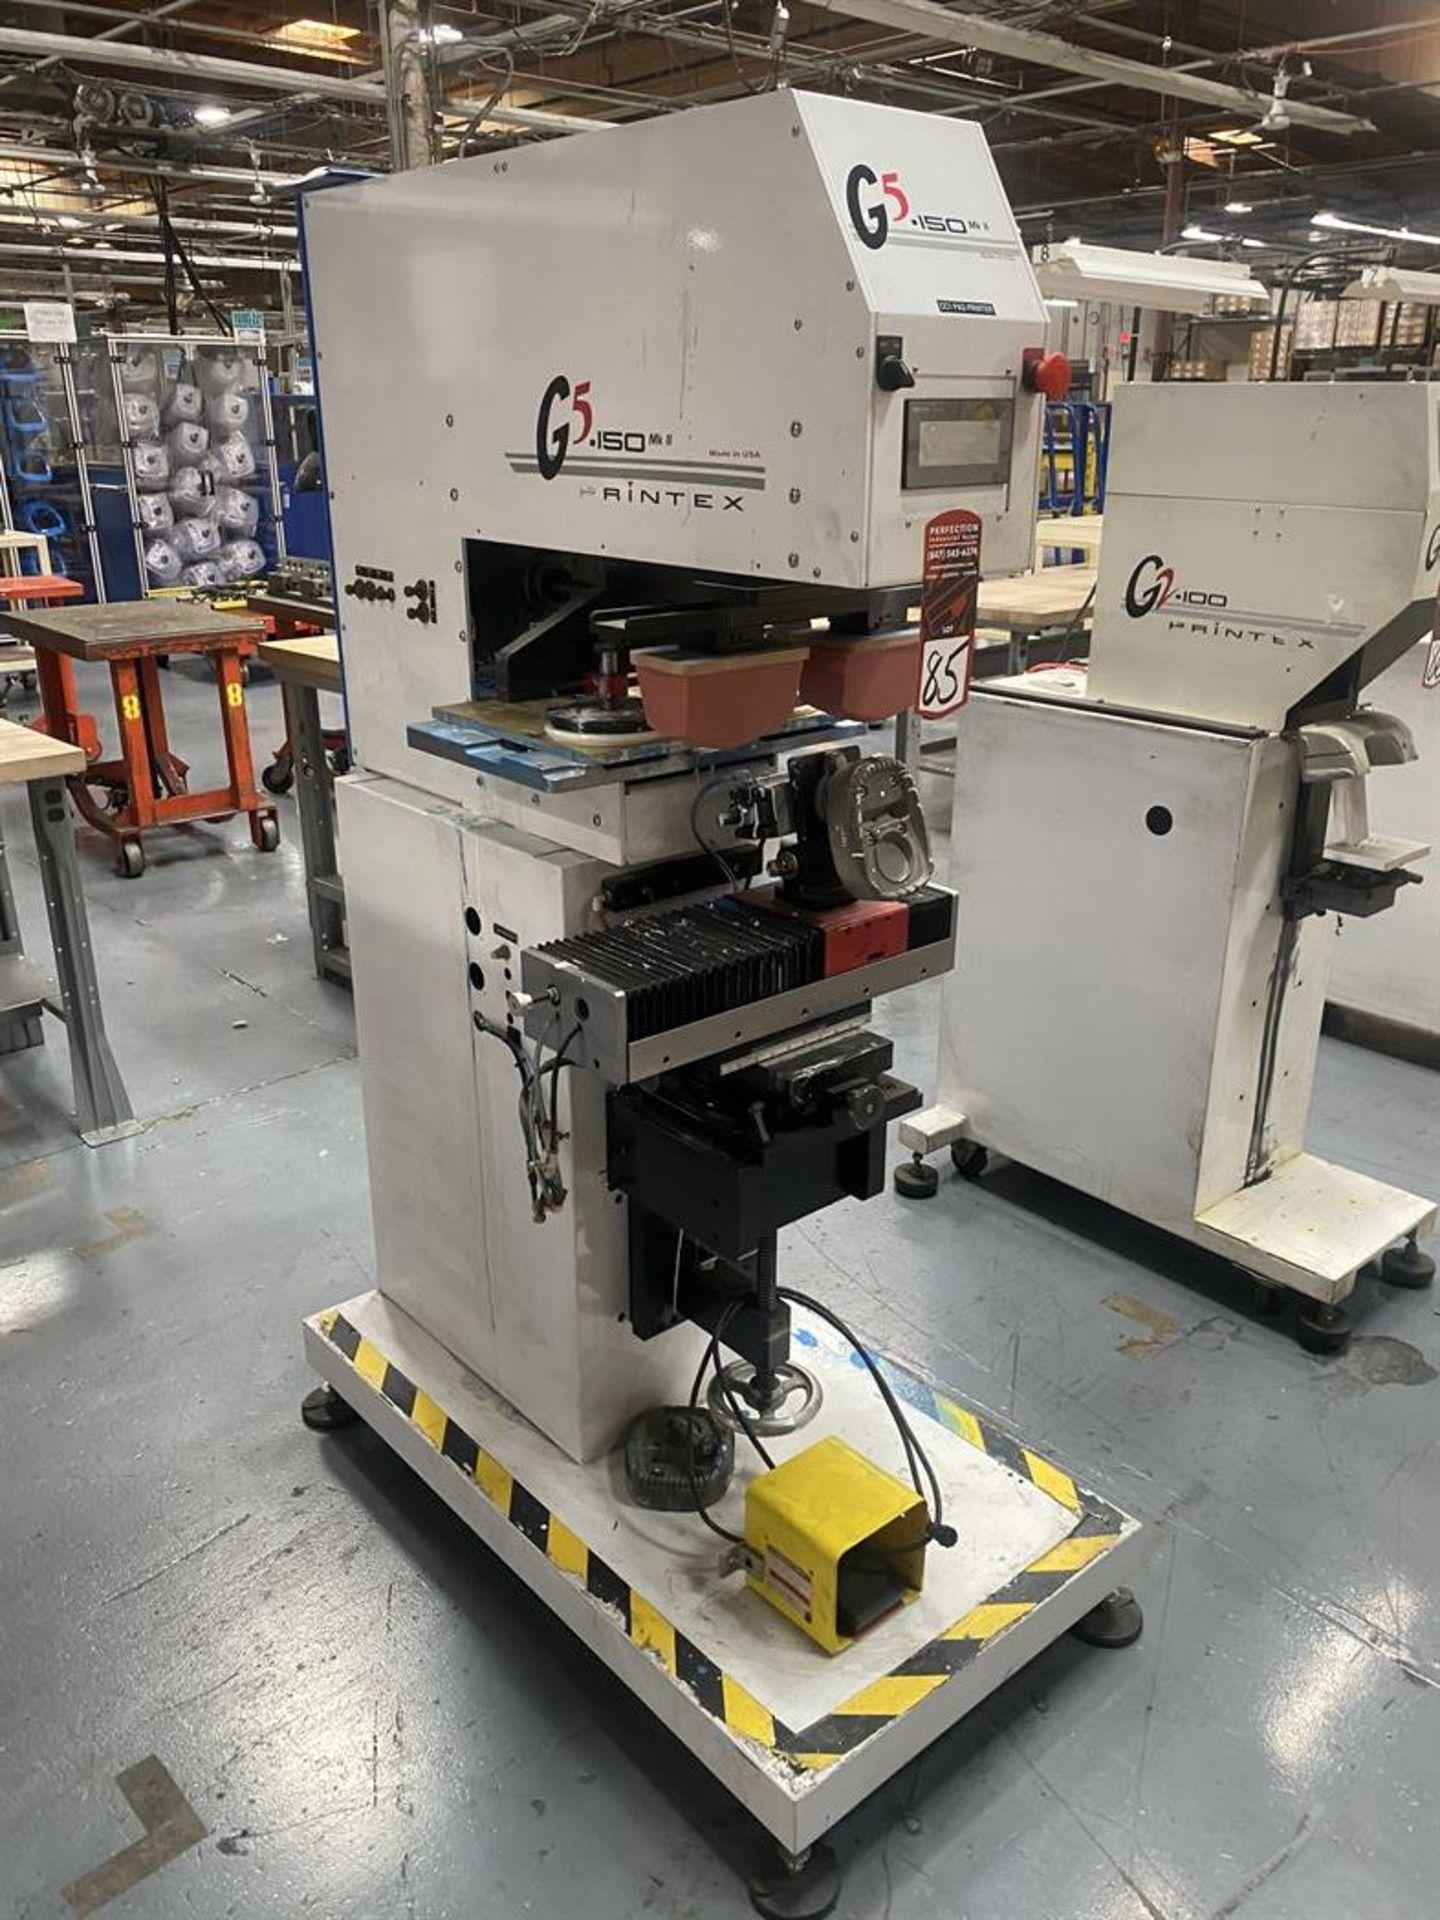 Lot 85 - Printex G5-150 MK II Multi-Function Pad Printing Machine, s/n na, Mitsubishi GOT1000 PLC